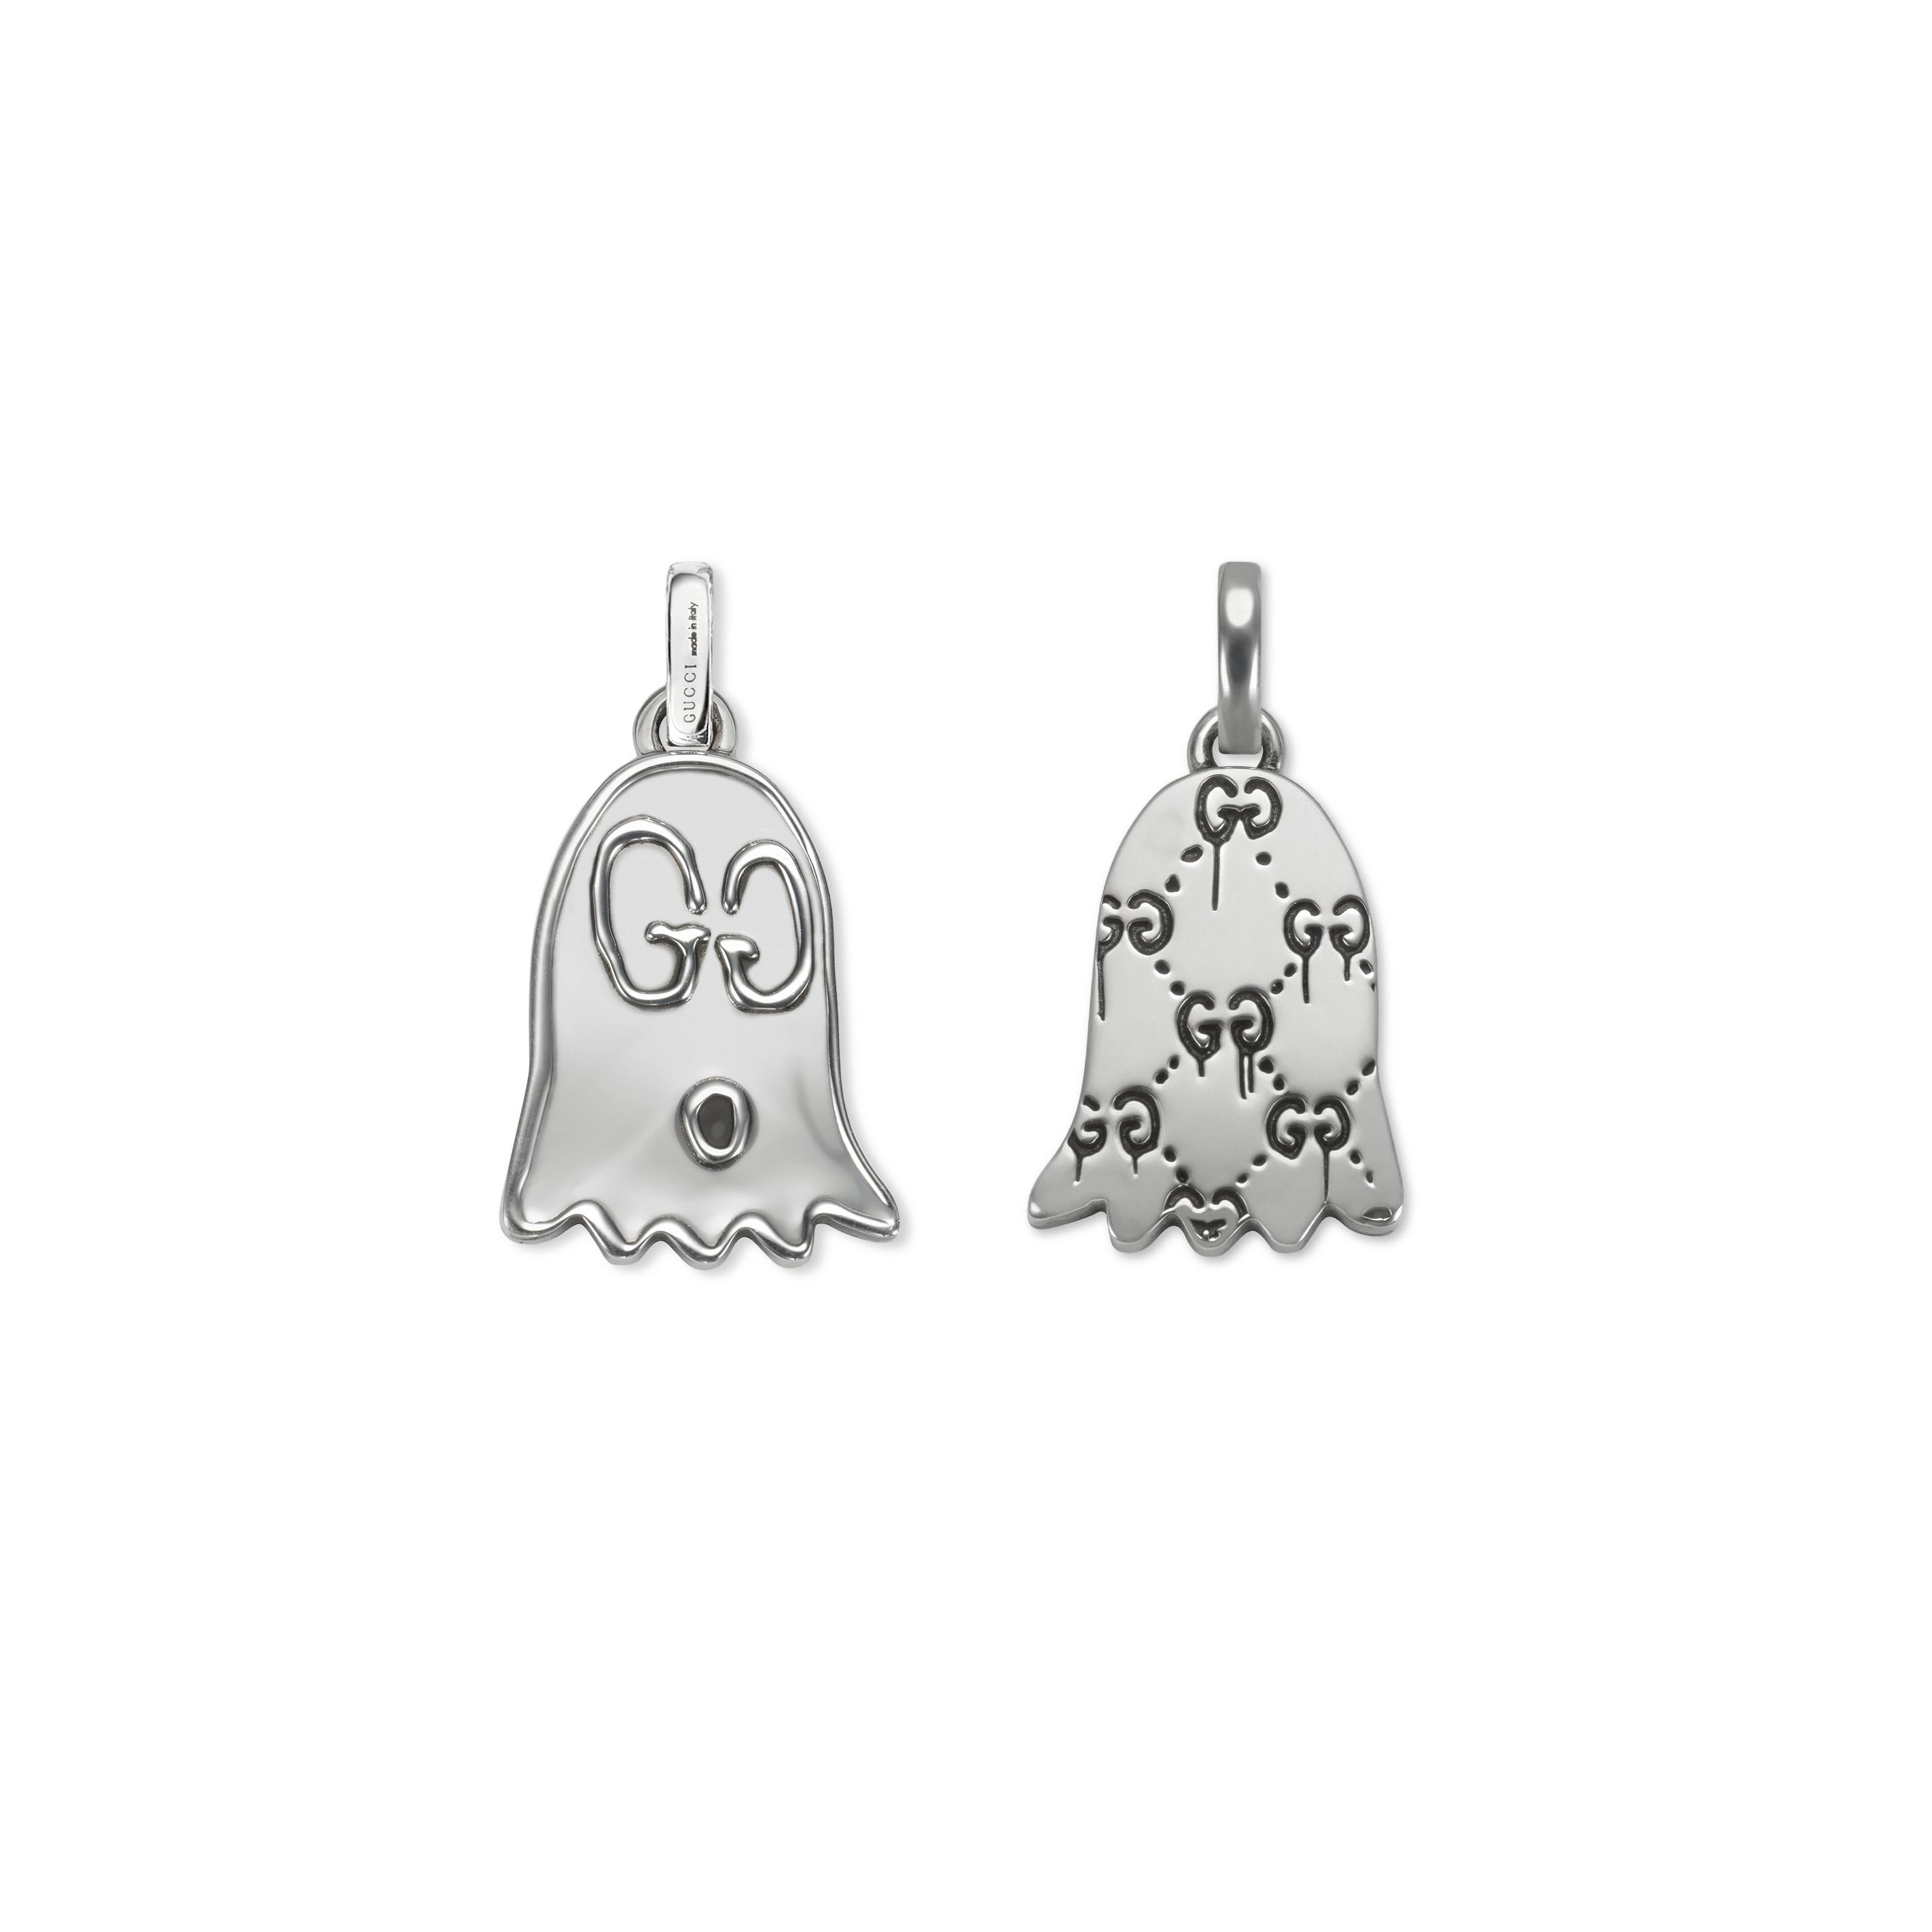 e0f4d371d96 Zancan Bracelet in silver and